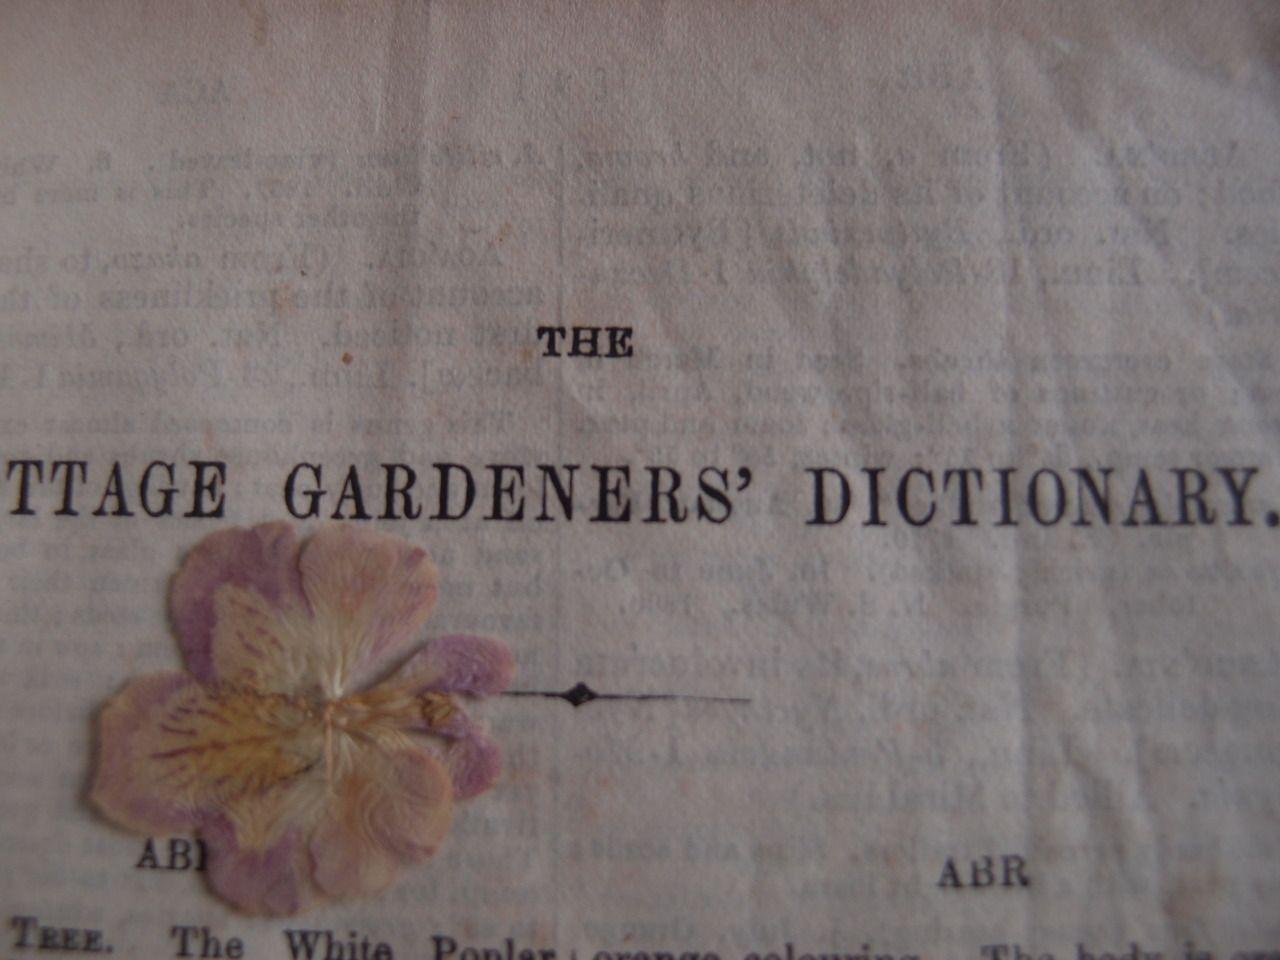 Amélies Little Secrets: Antique books, magic & stardast